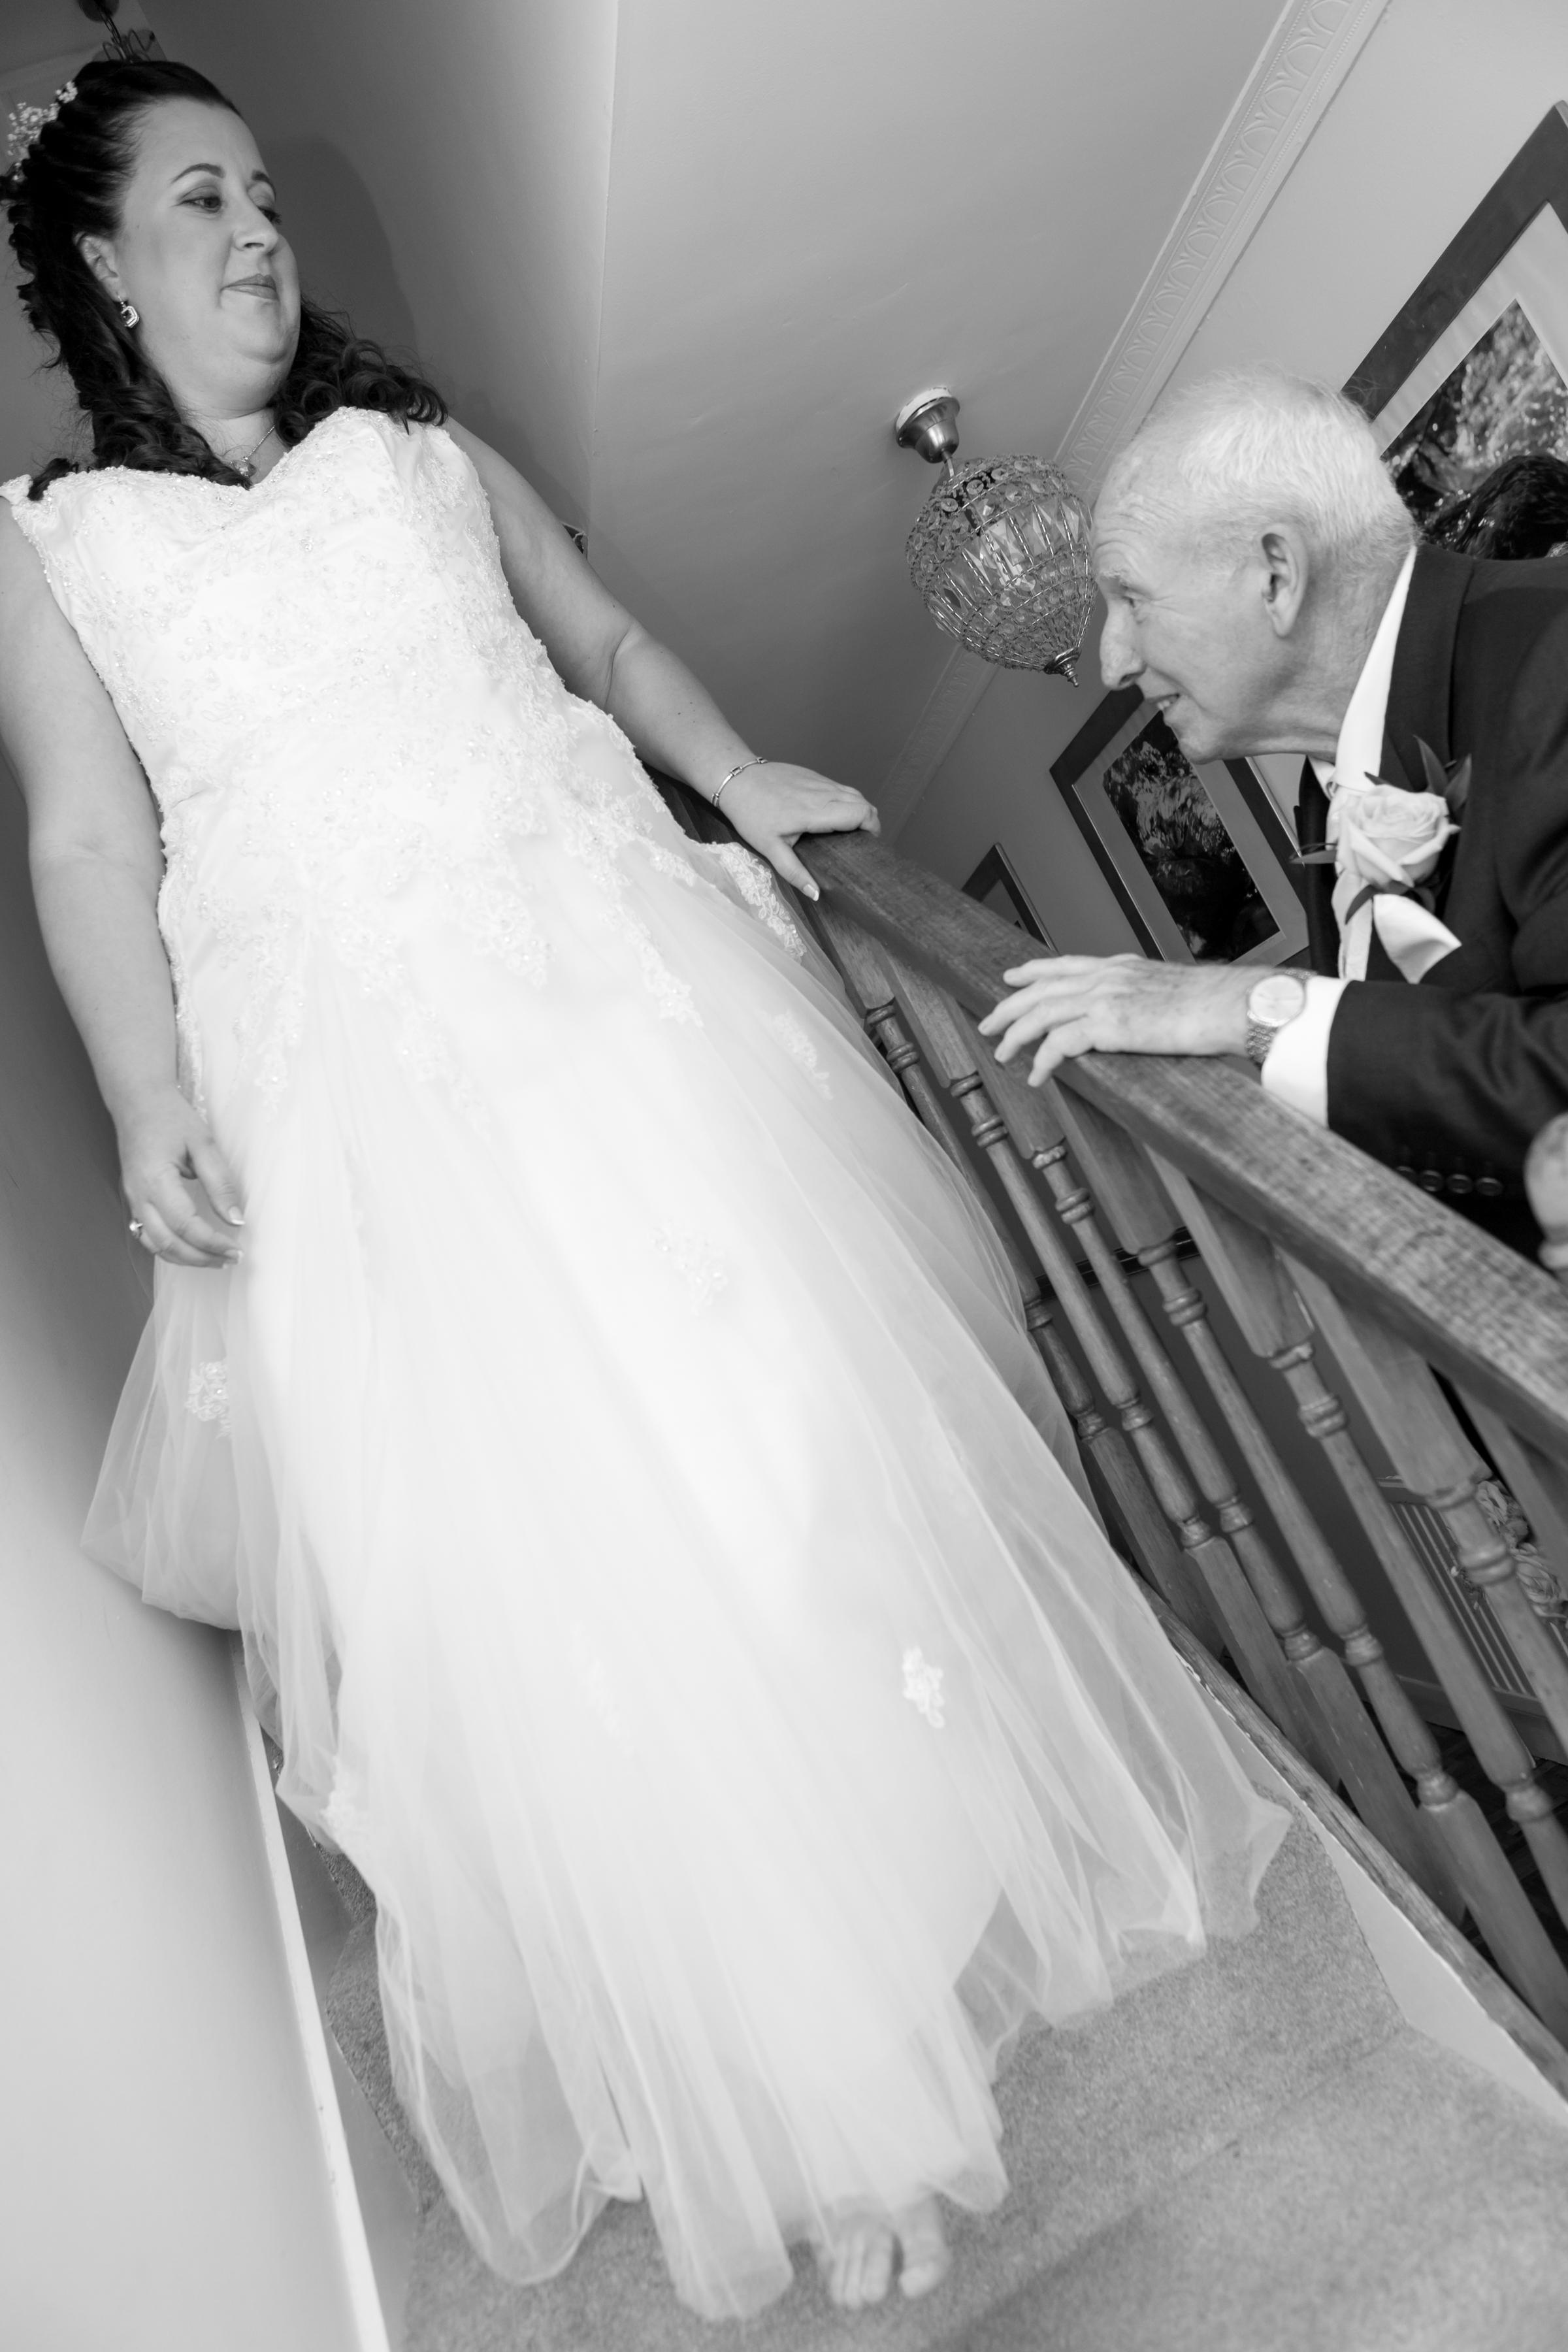 Marbella, Malaga Weddings